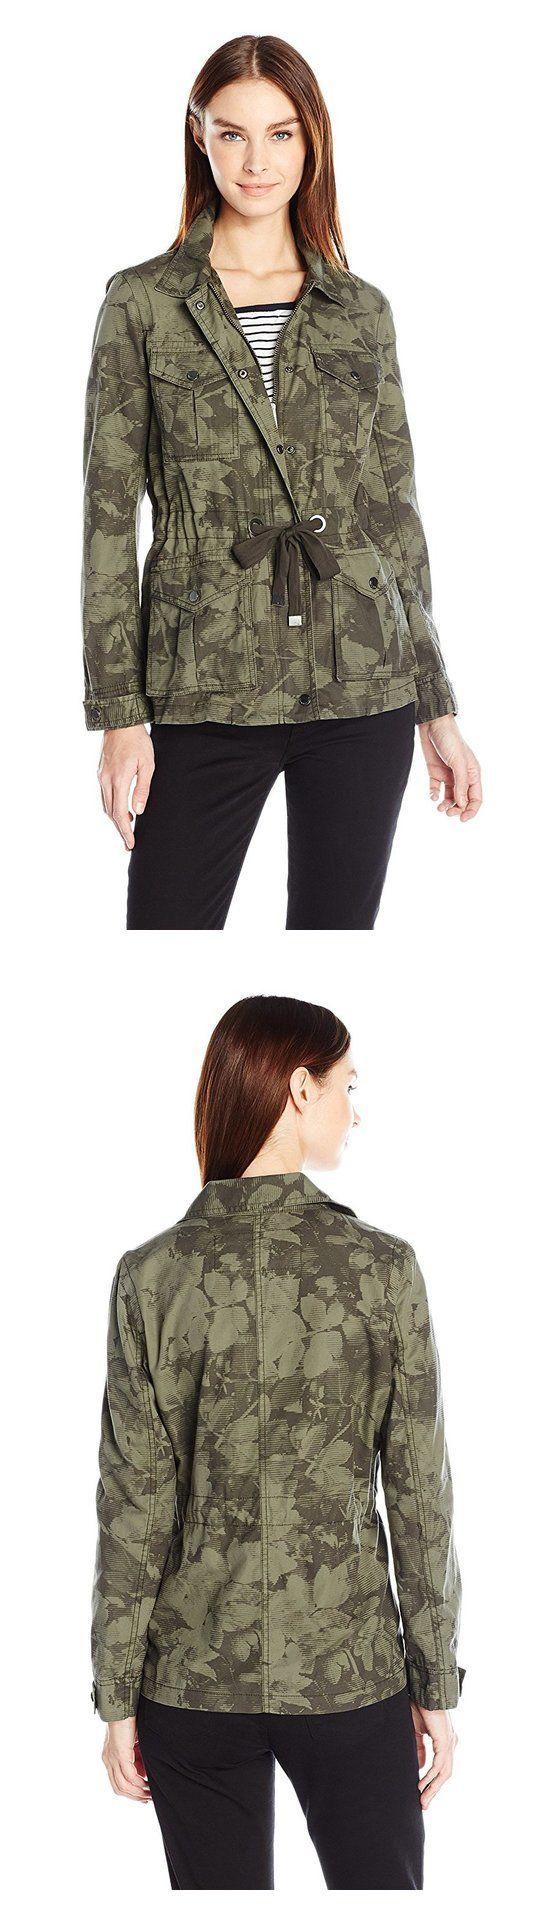 $98.78 - Calvin Klein Jeans Women's Camo Utility Field Jacket Peat #calvinklein